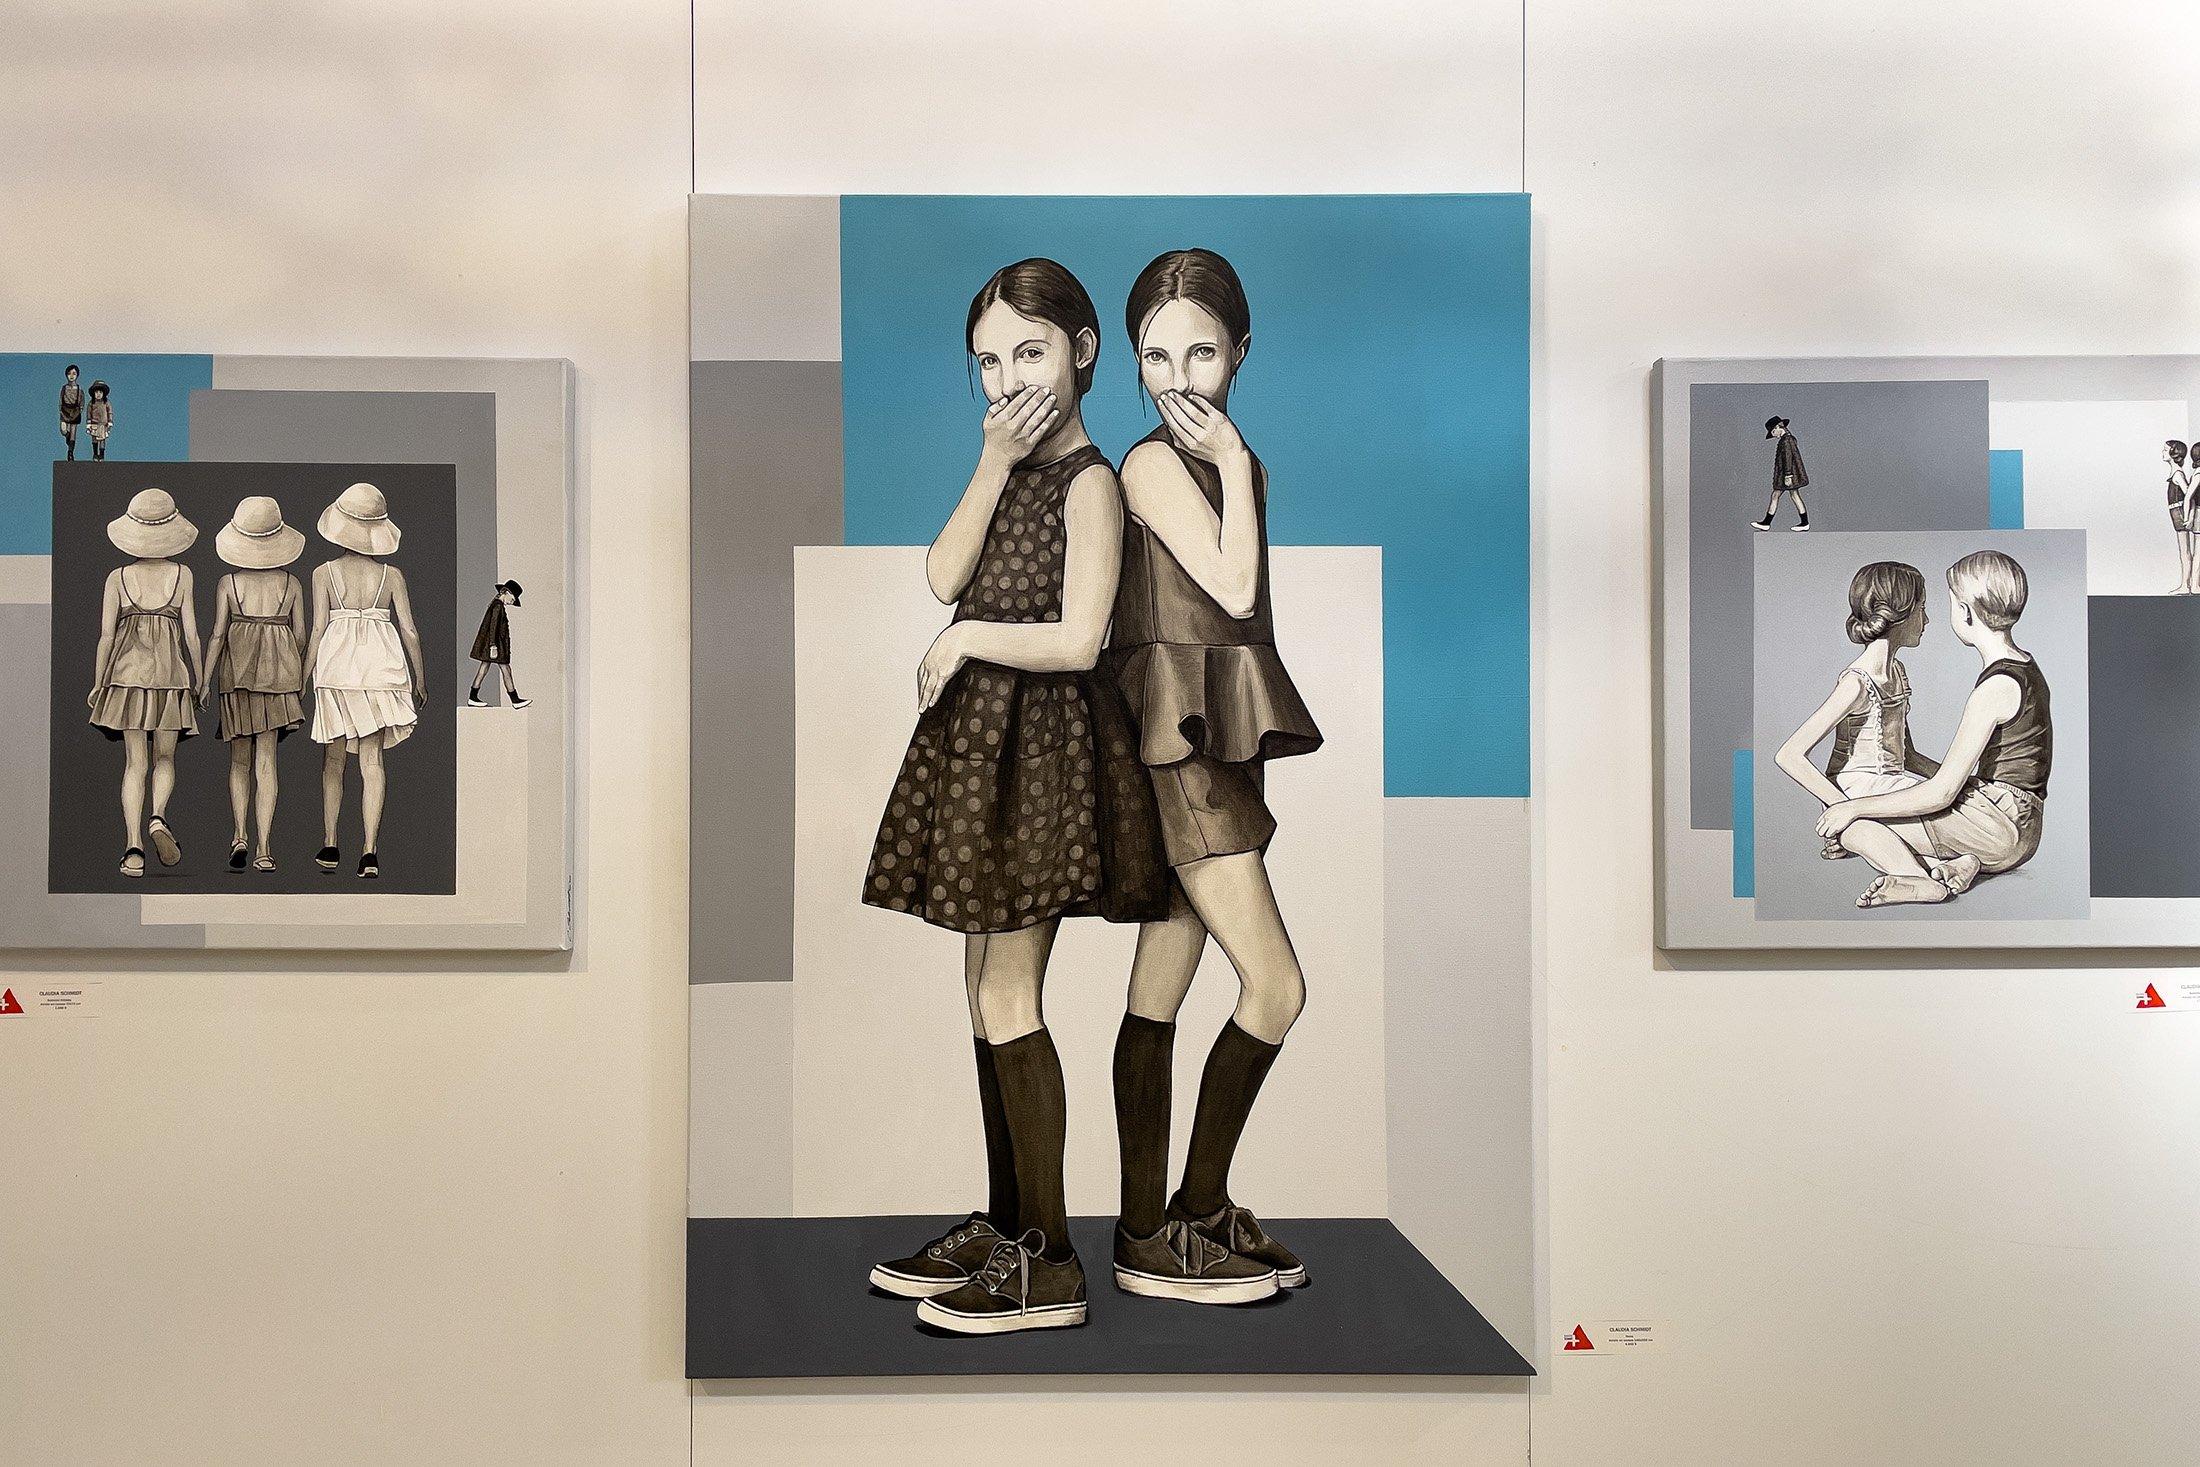 Claudia Schmidt, 'Twins,' 2021, acrylic on canvas, 140 by 100 centimeters. (Photo by Ahmet Koçak)